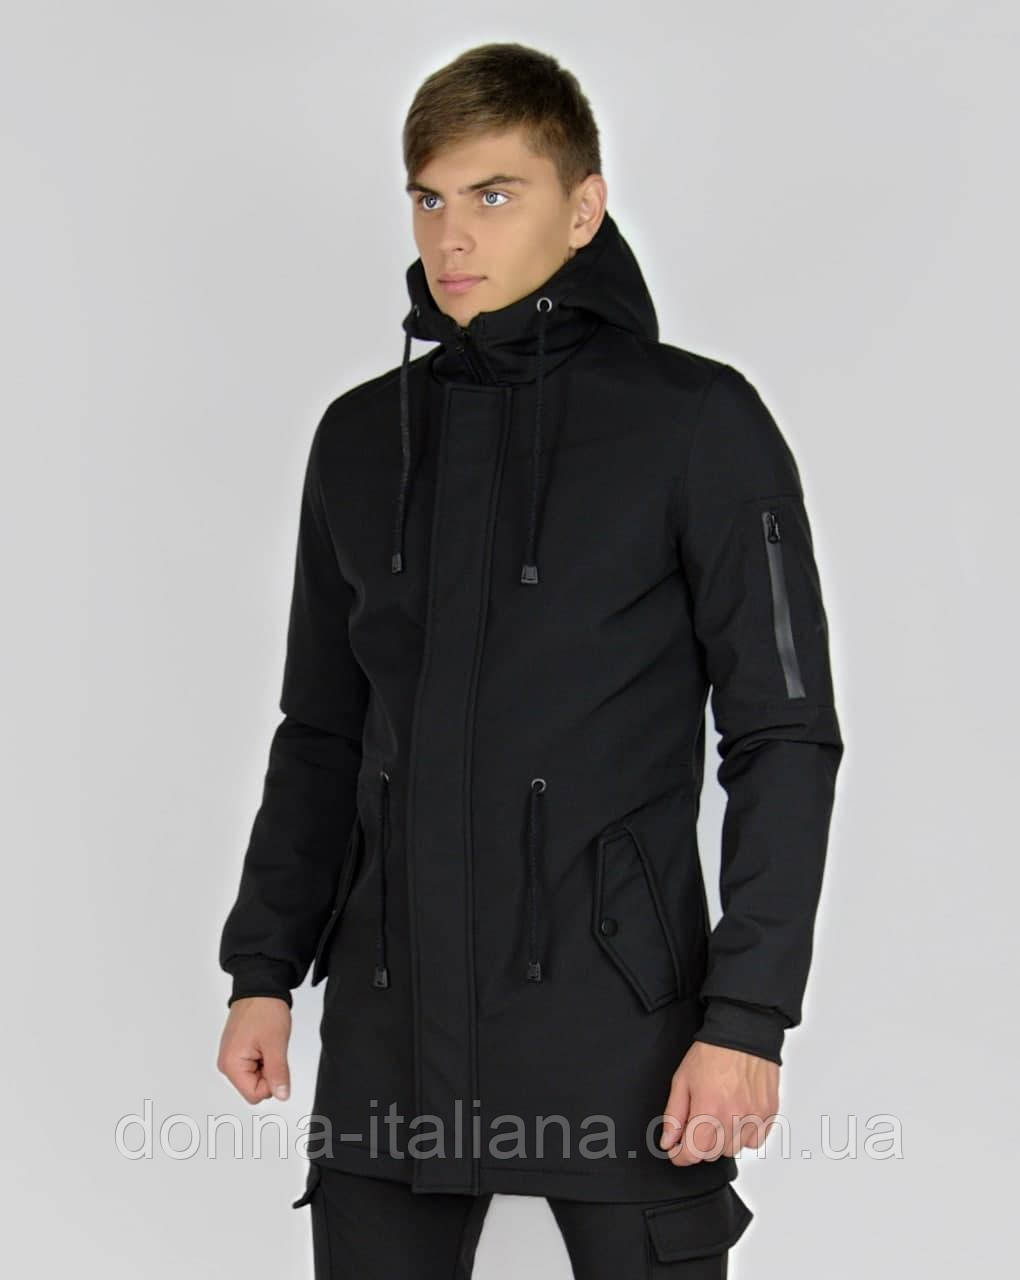 Куртка Intruder Softshell V2.0 чорна ХХL (1604481427/4)